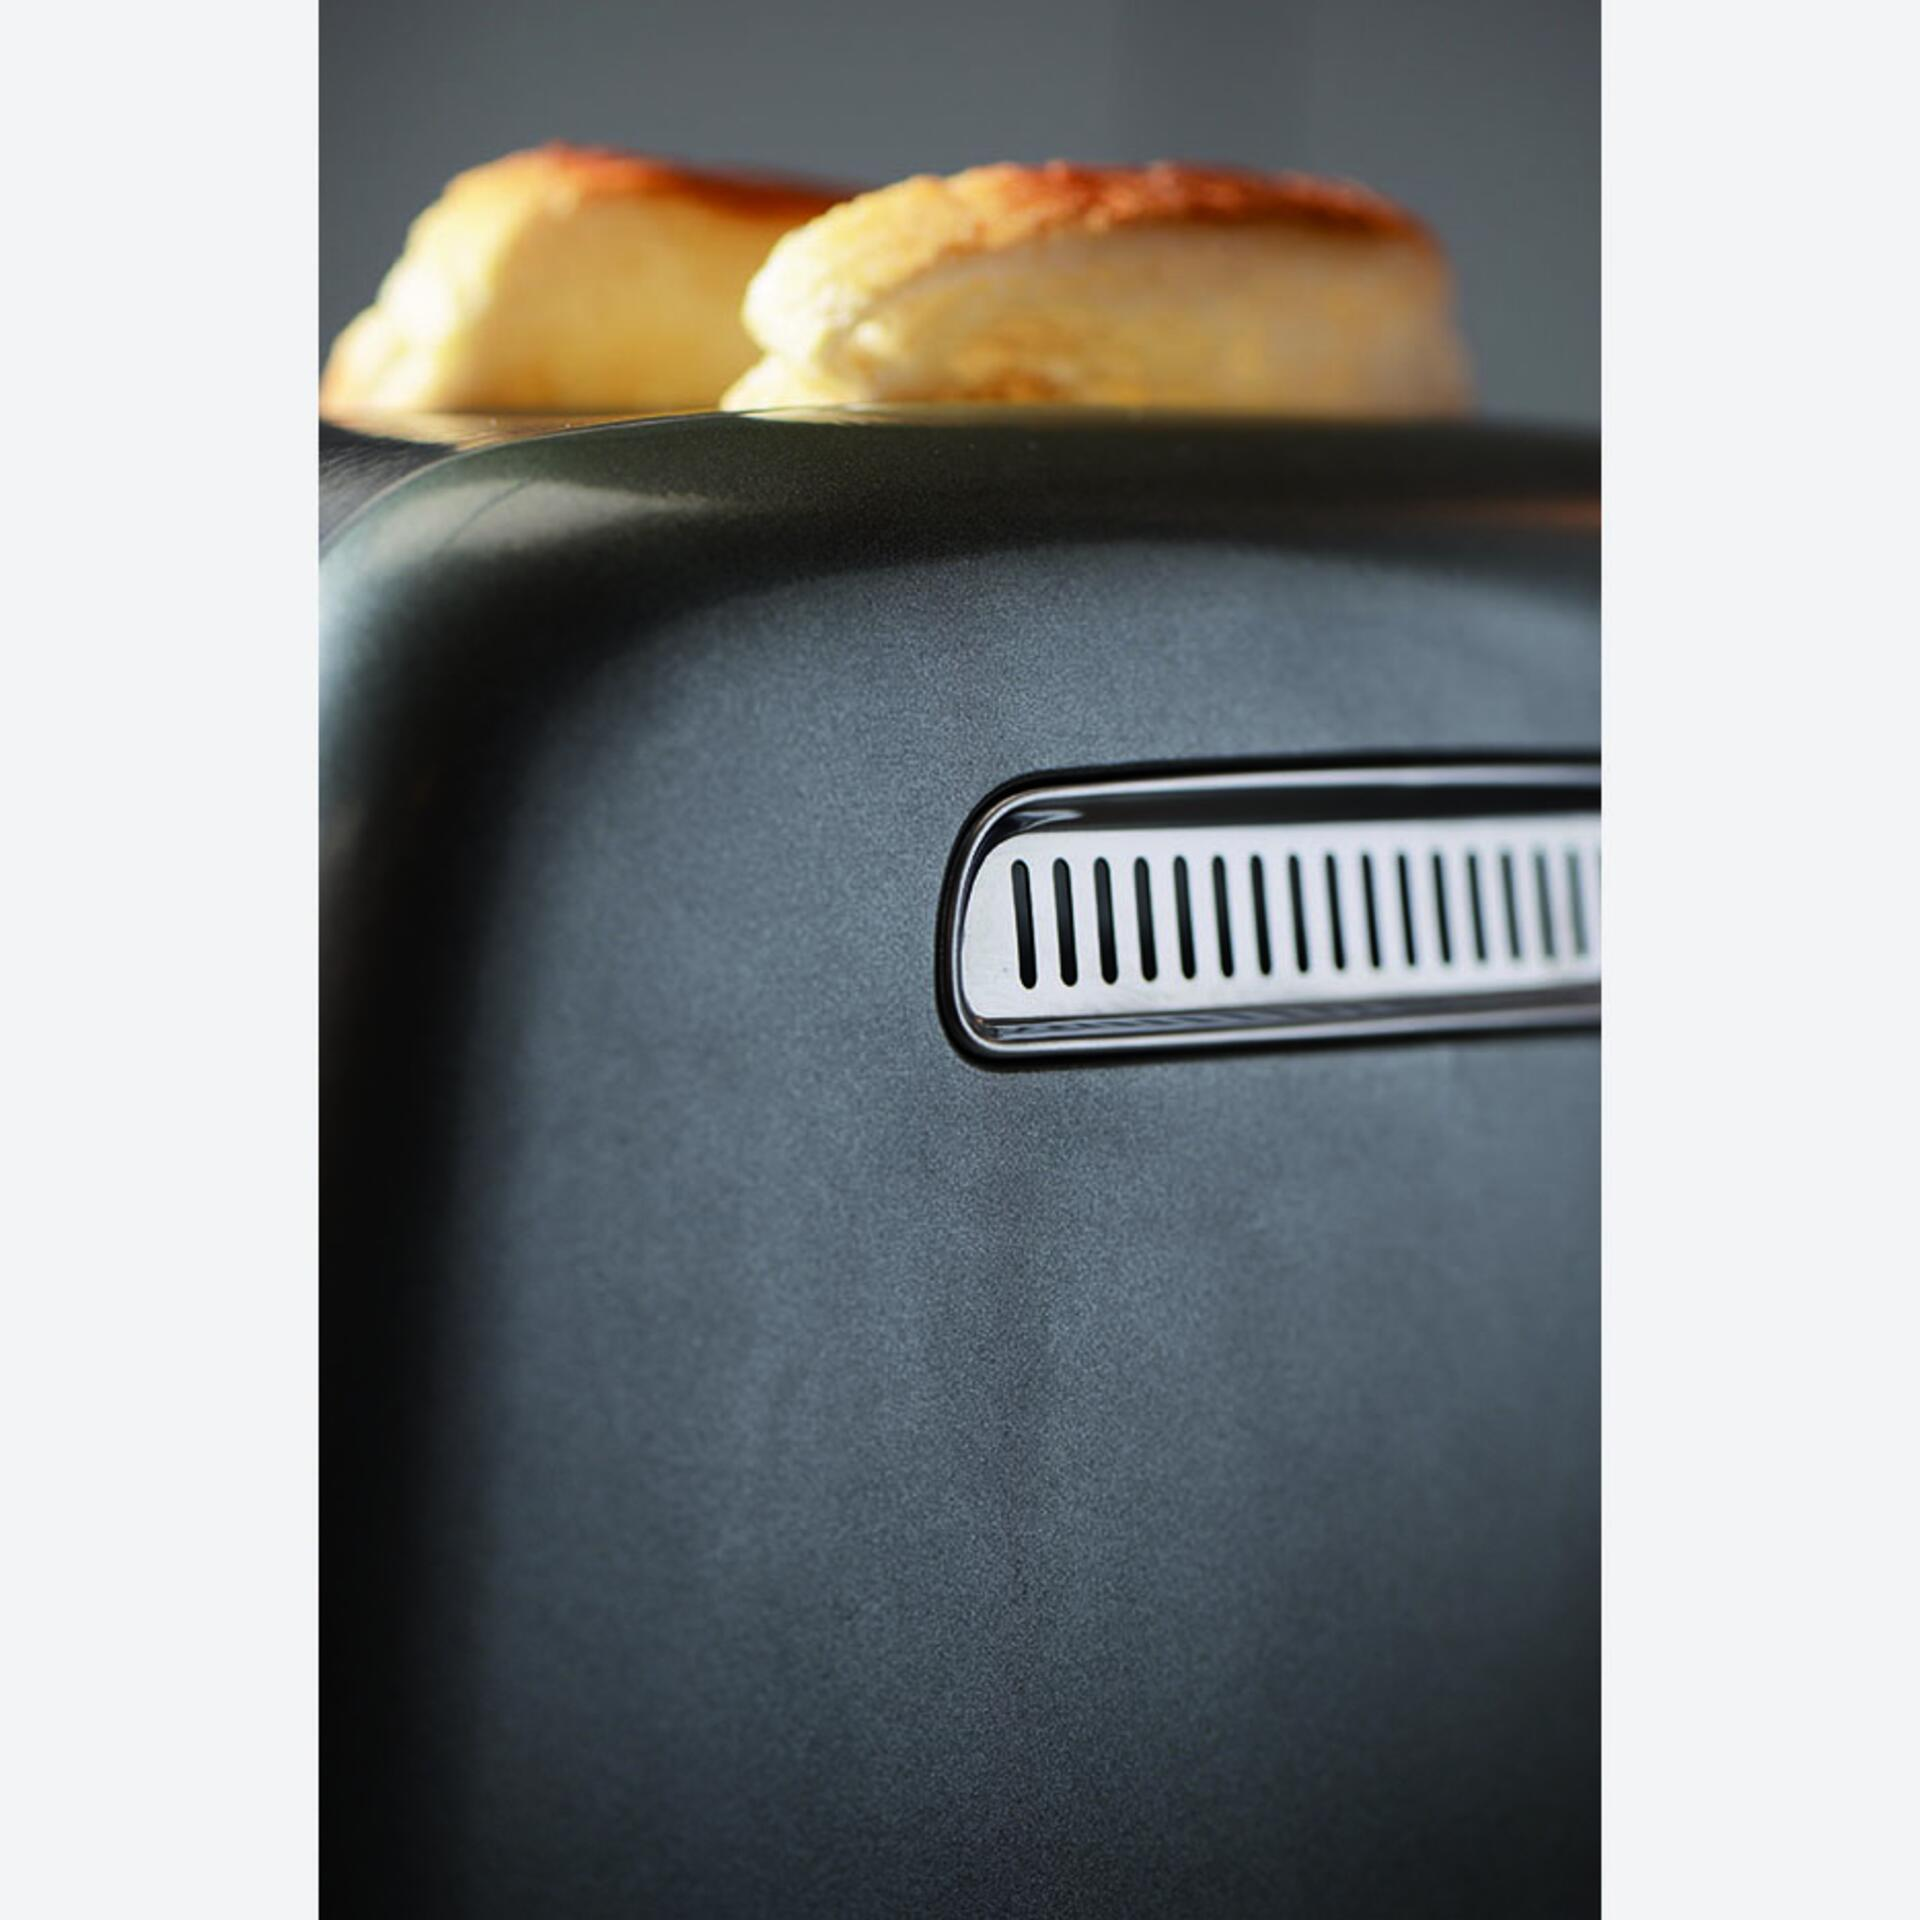 KitchenAid Toaster Empire Red 5KMT221EER